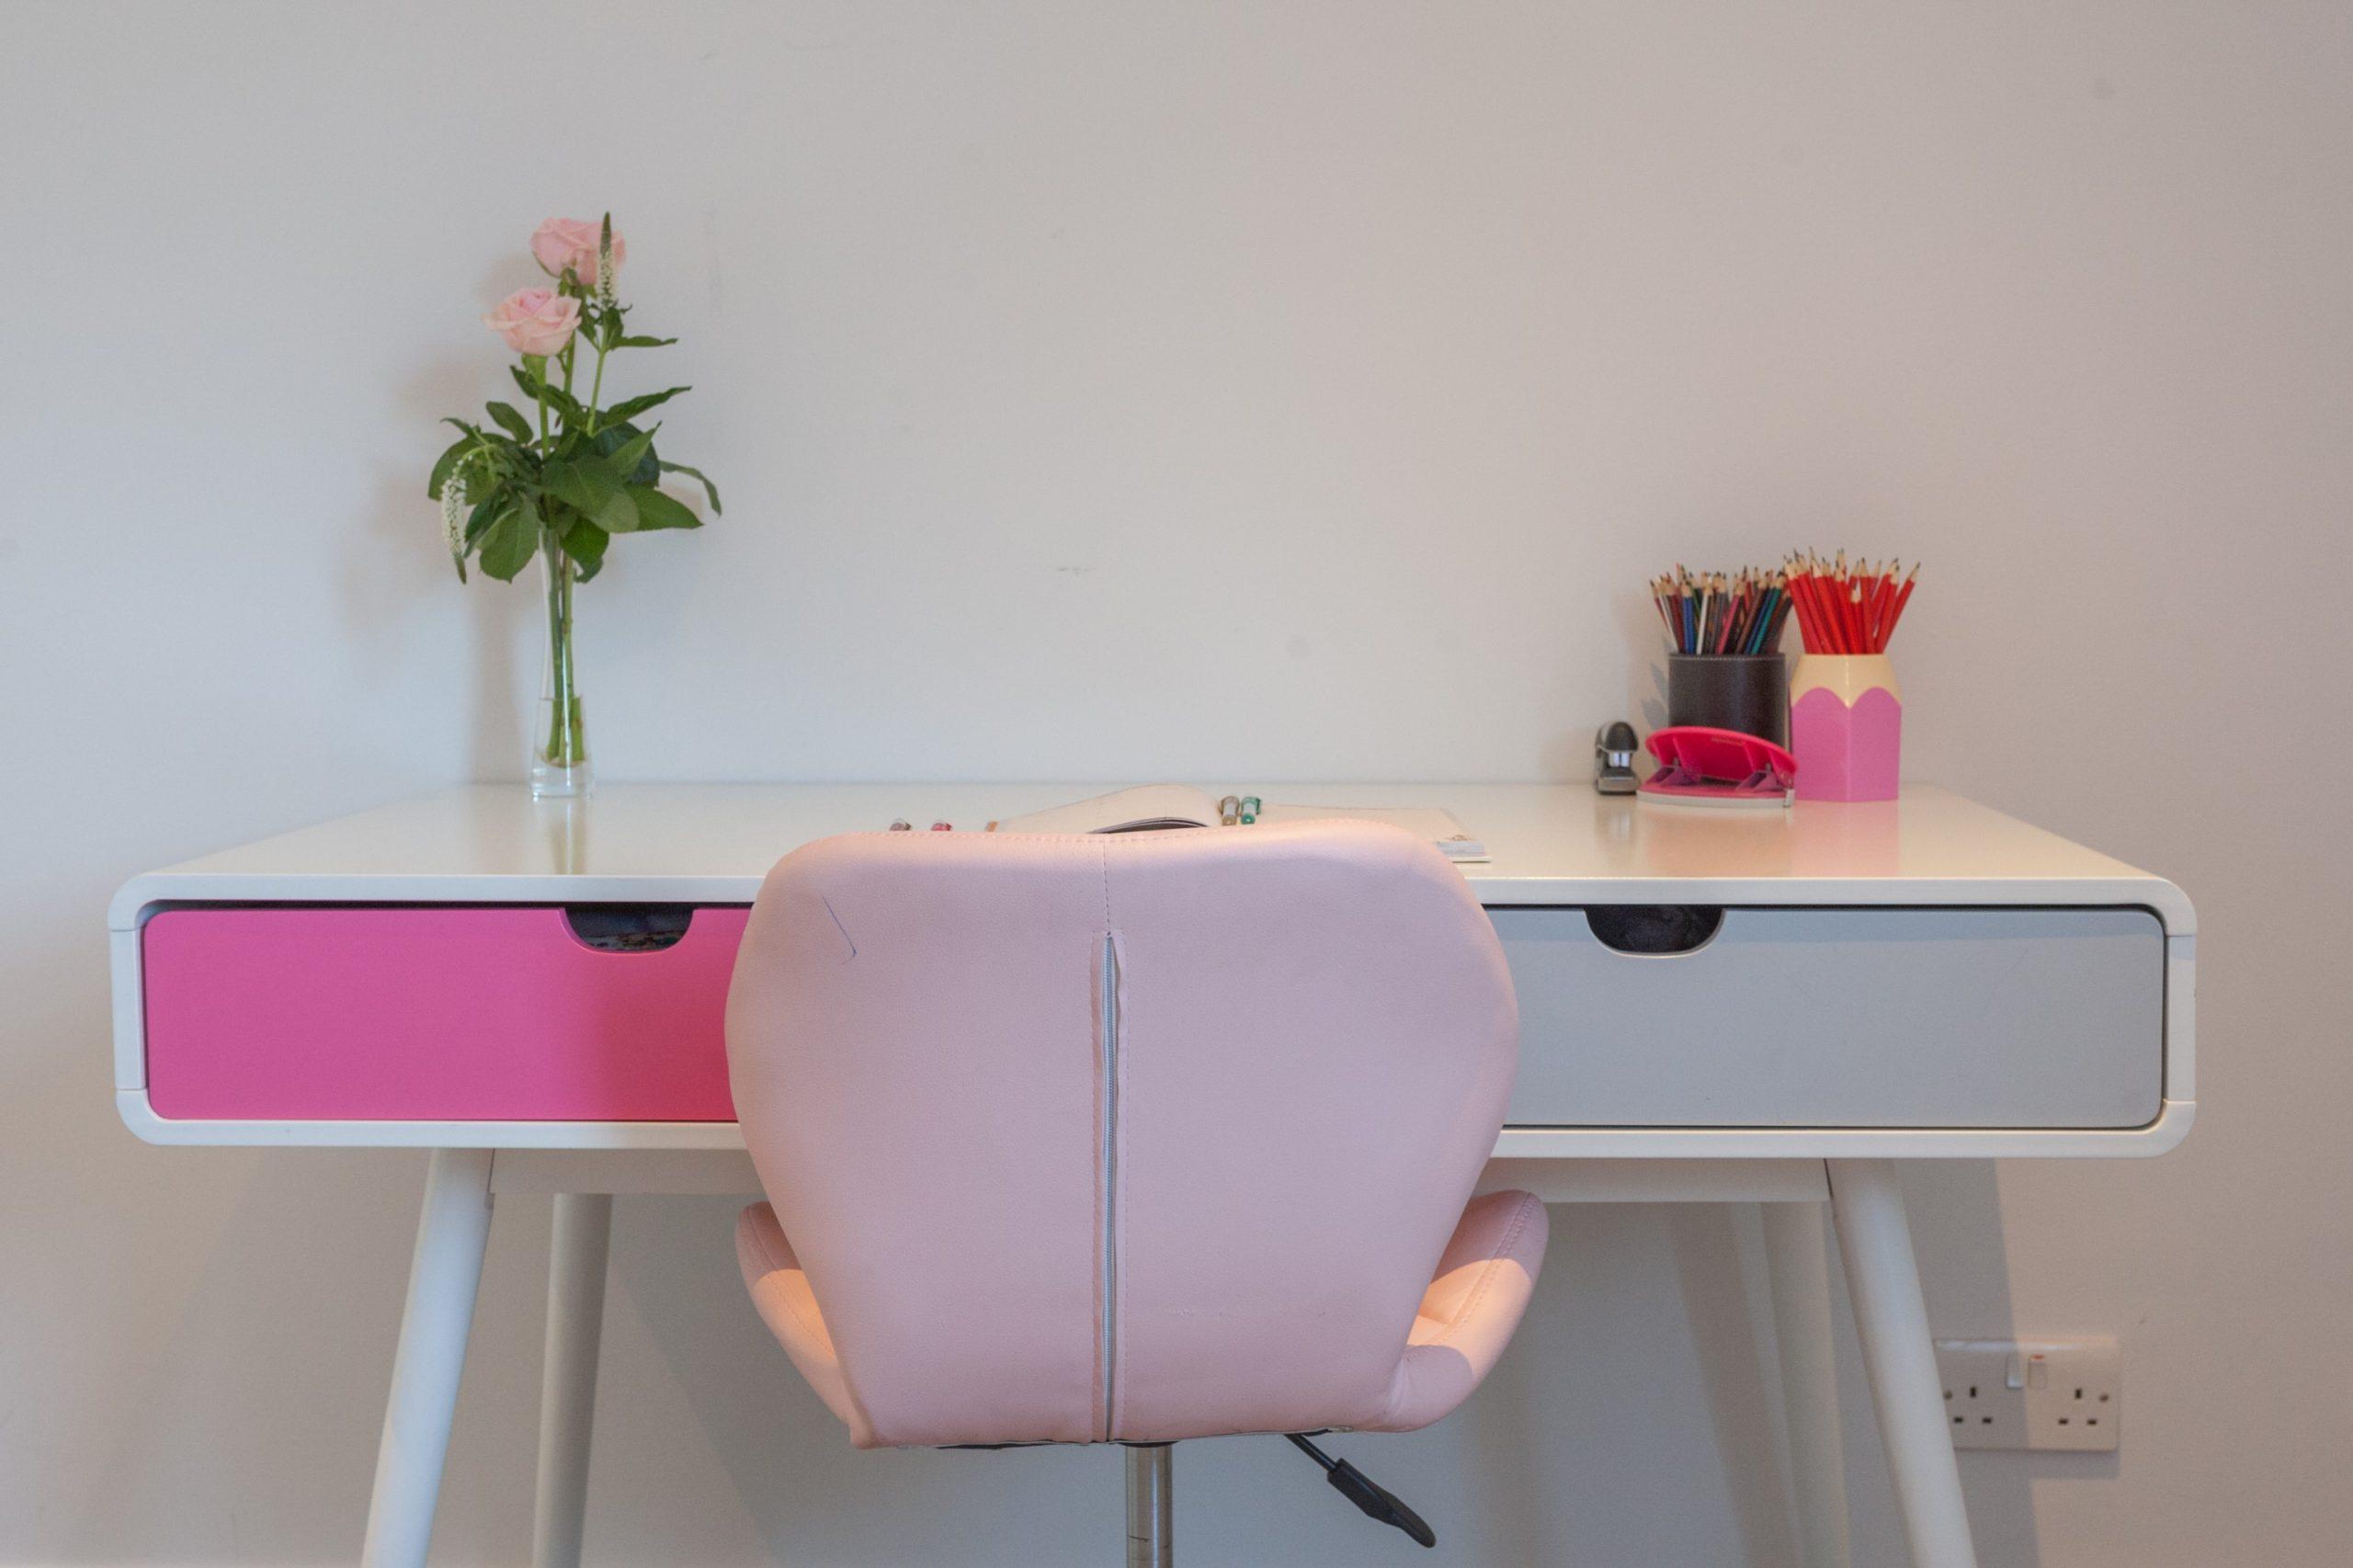 rjv-home-design-refurbishment-london-61141d3796979